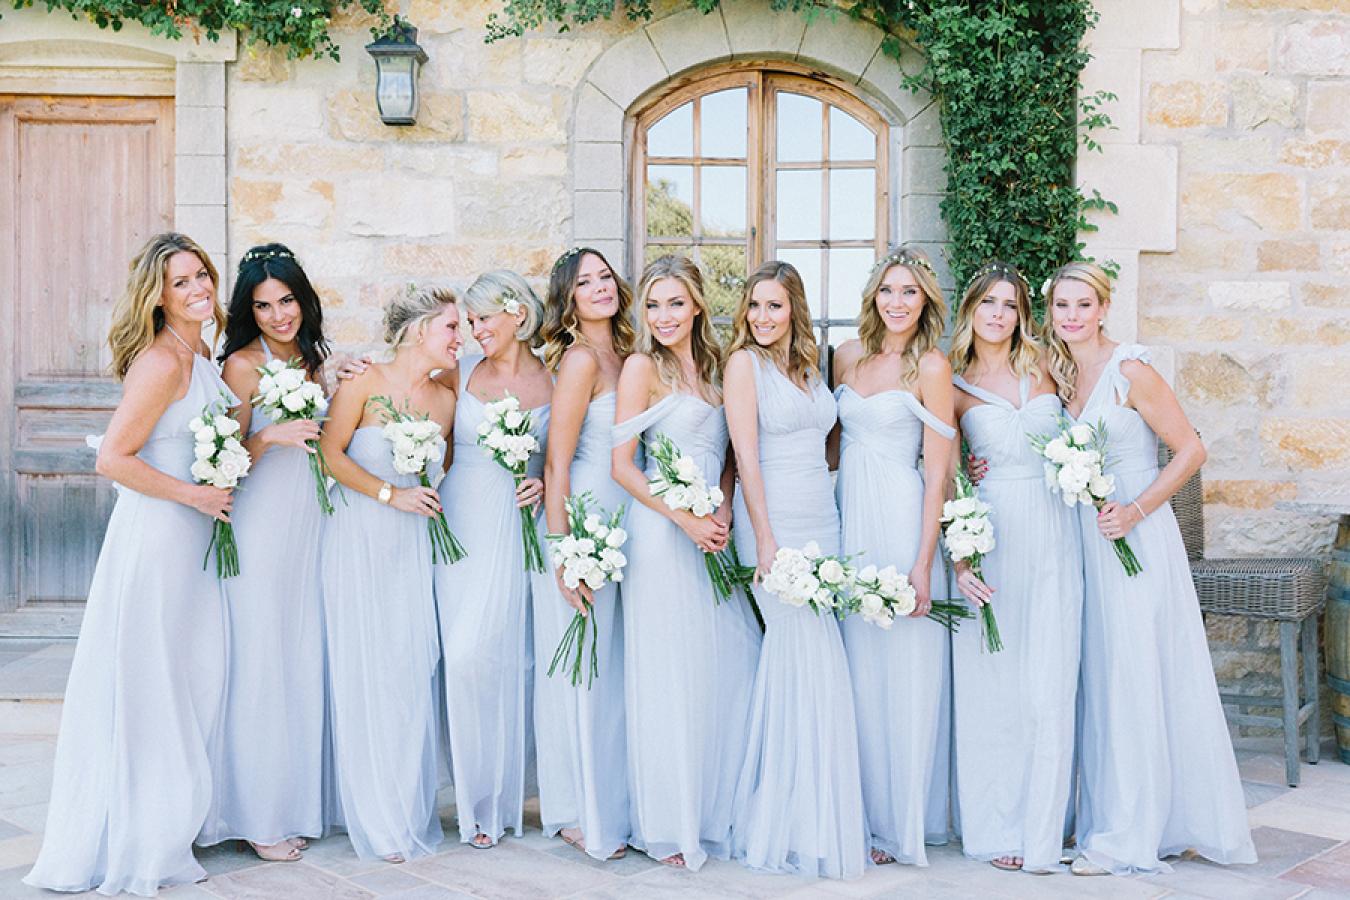 pemilihan warna baju bridesmaids